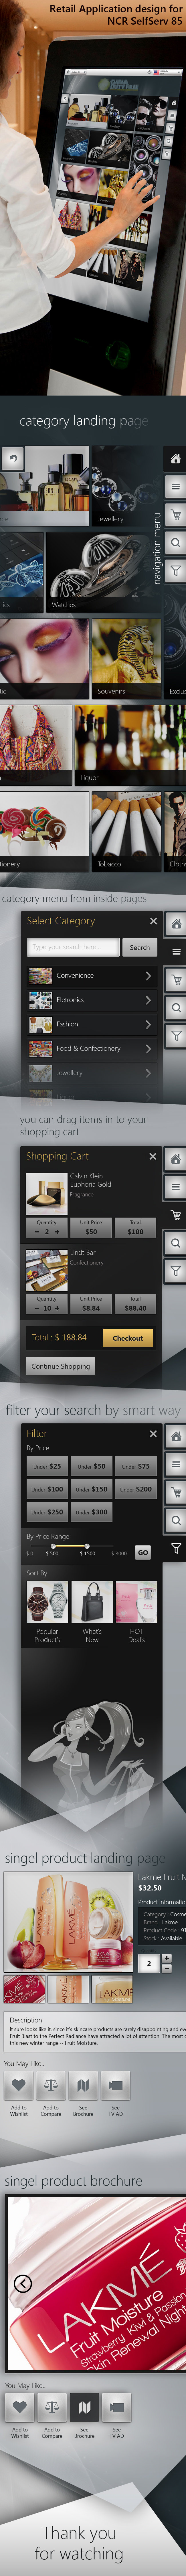 Retail Application design for NCR SelfServ 85